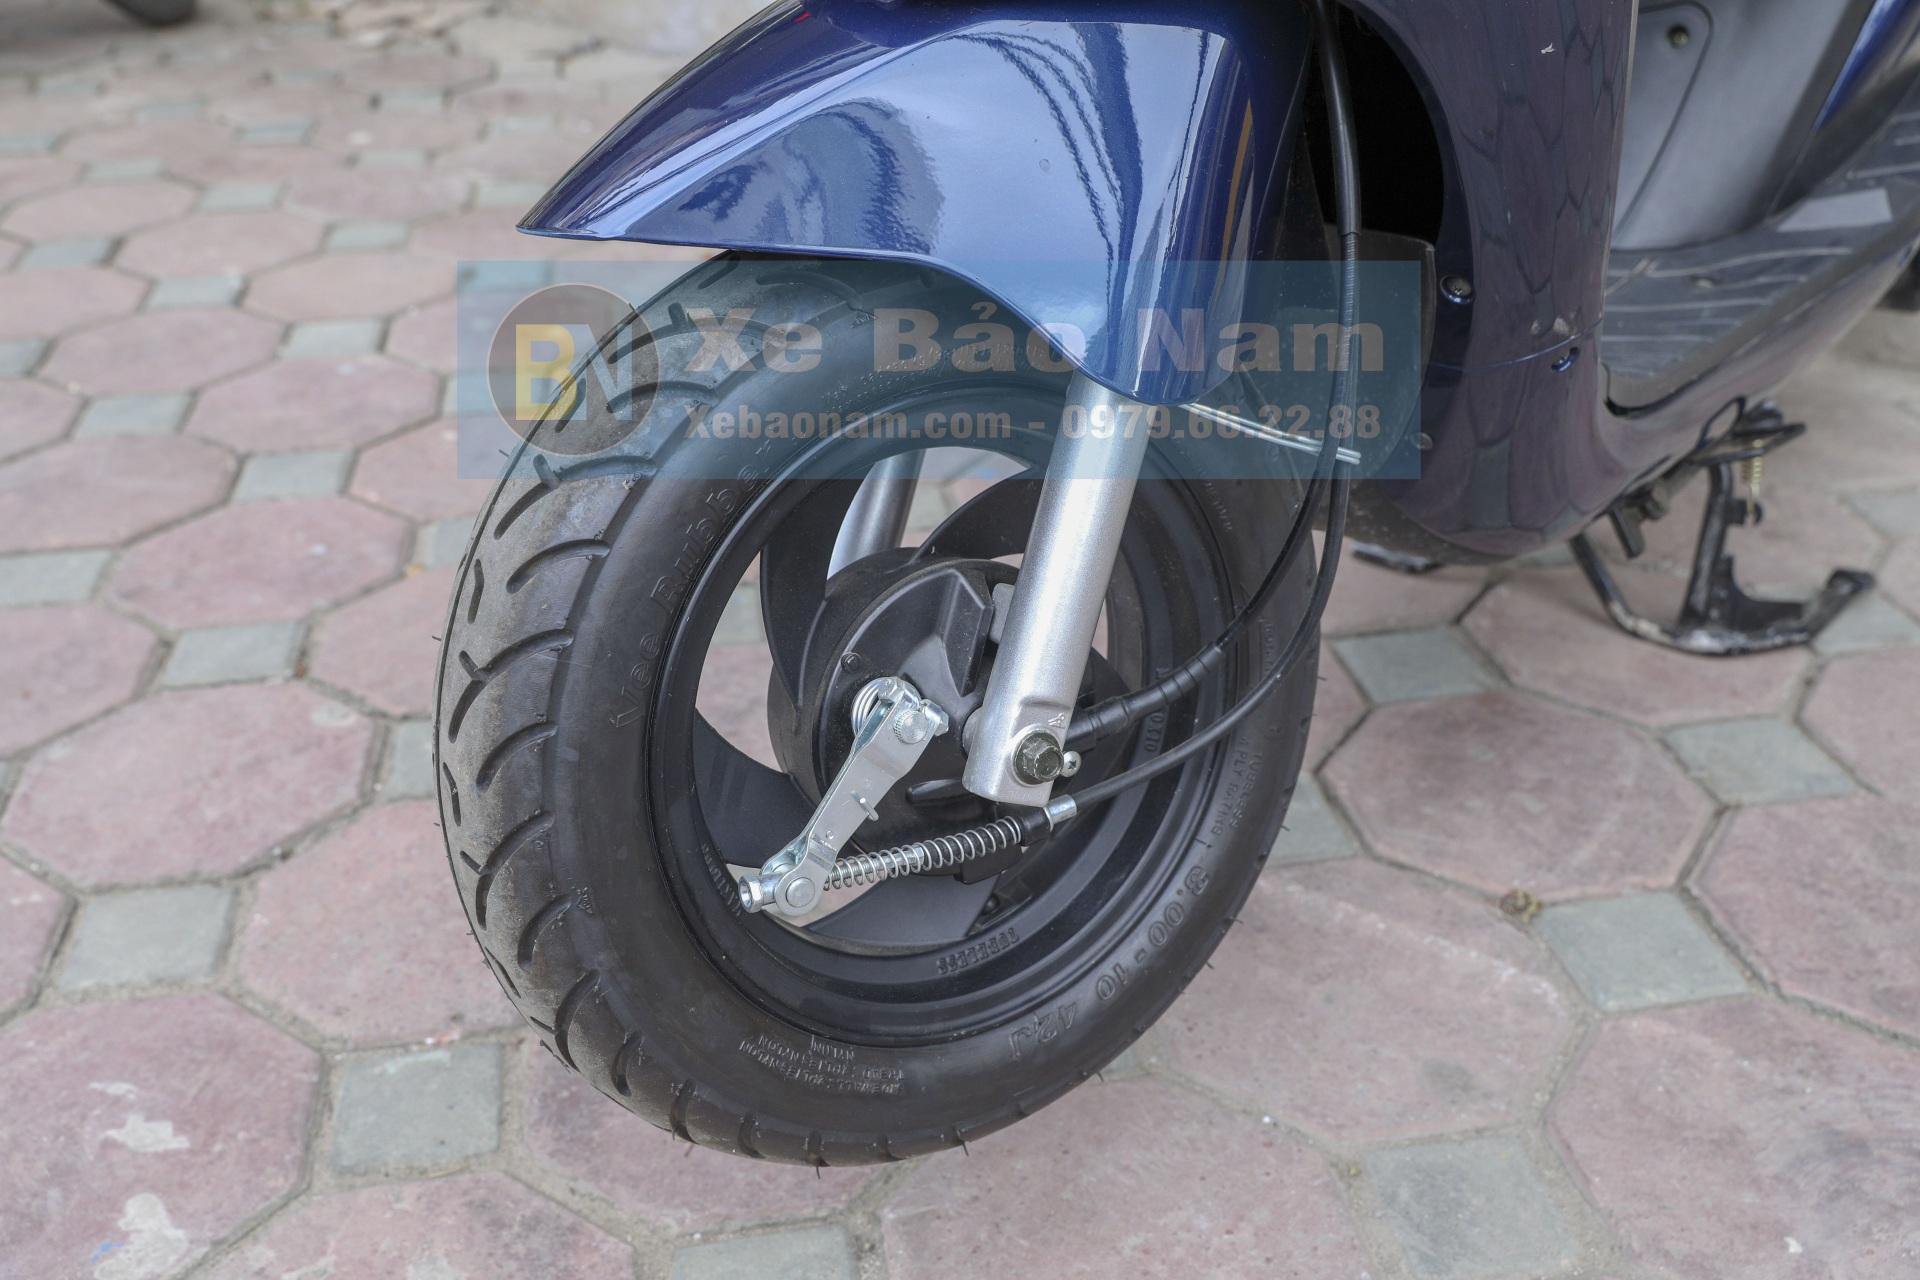 xe-may-zip-50cc-xebaonam-3